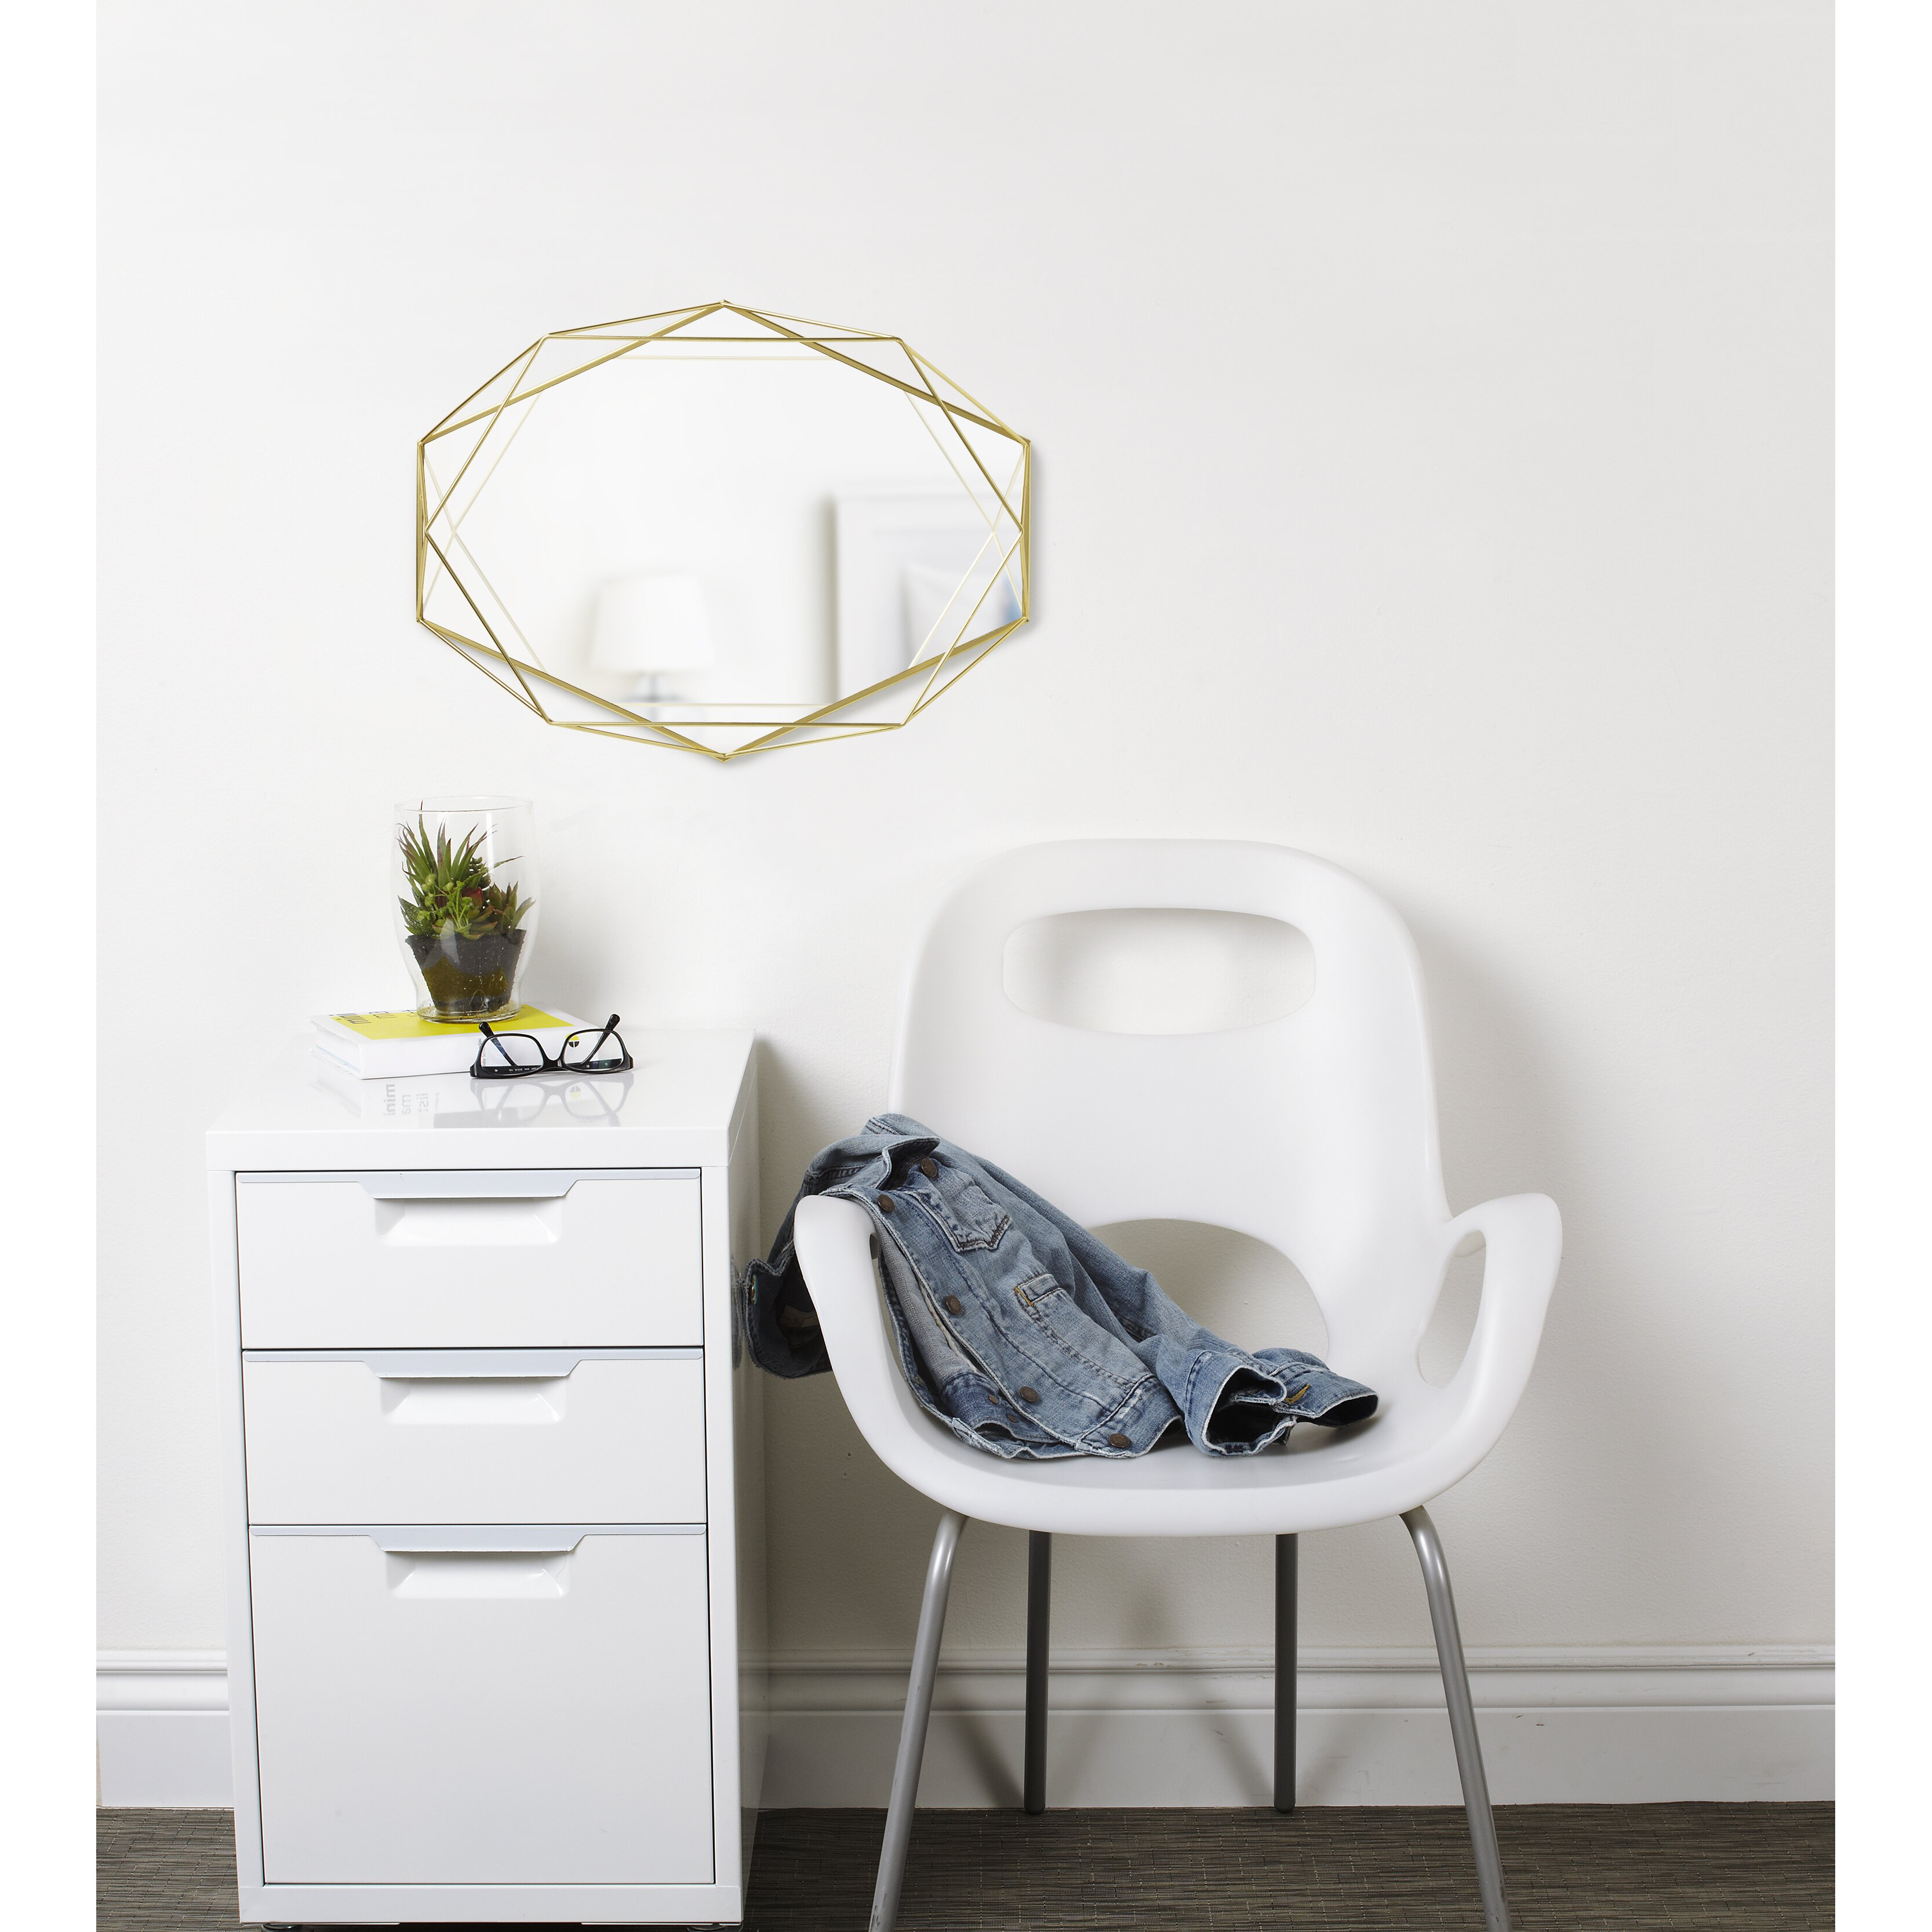 Umbra prisma wall mirror reviews wayfair for Miroir umbra